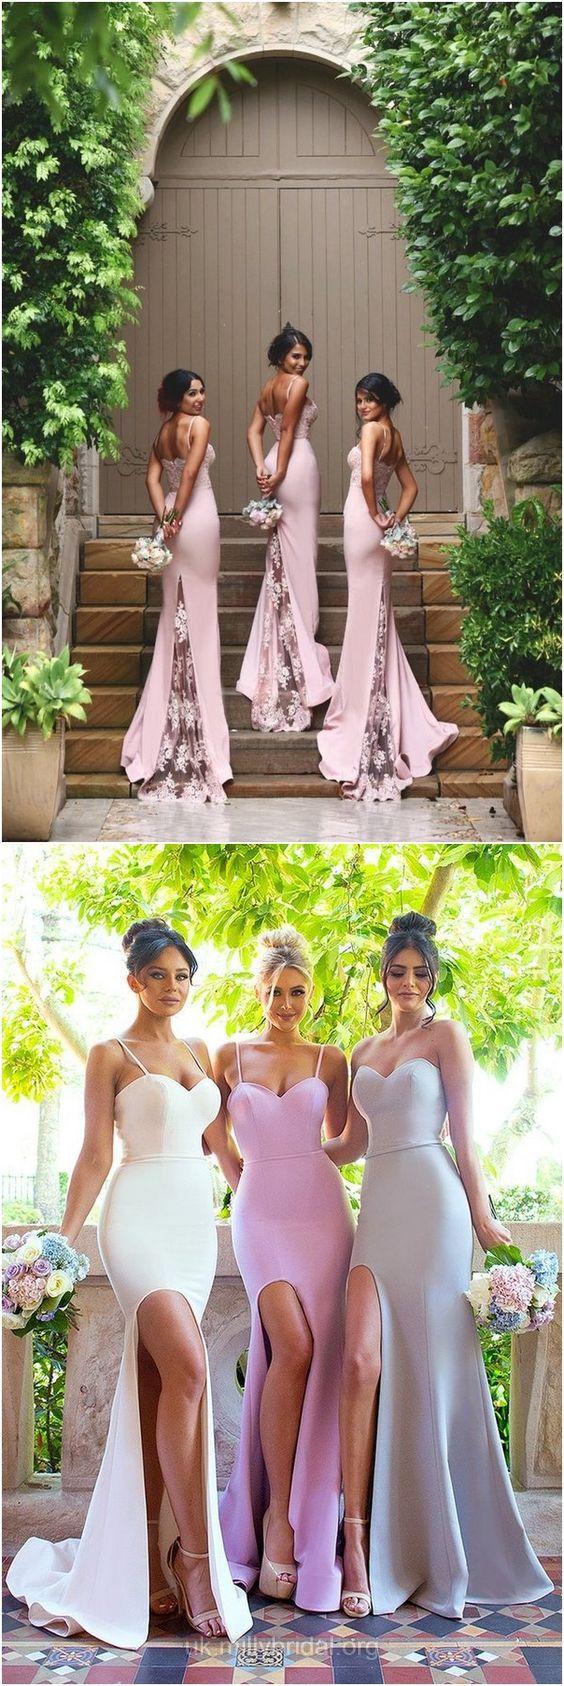 Mermaid Bridesmaid Dresses Sweetheart,Long Bridesmaid Dress Pink, Silk-like Satin Sweep Train Ruffles Bridesmaid Dresses Modest